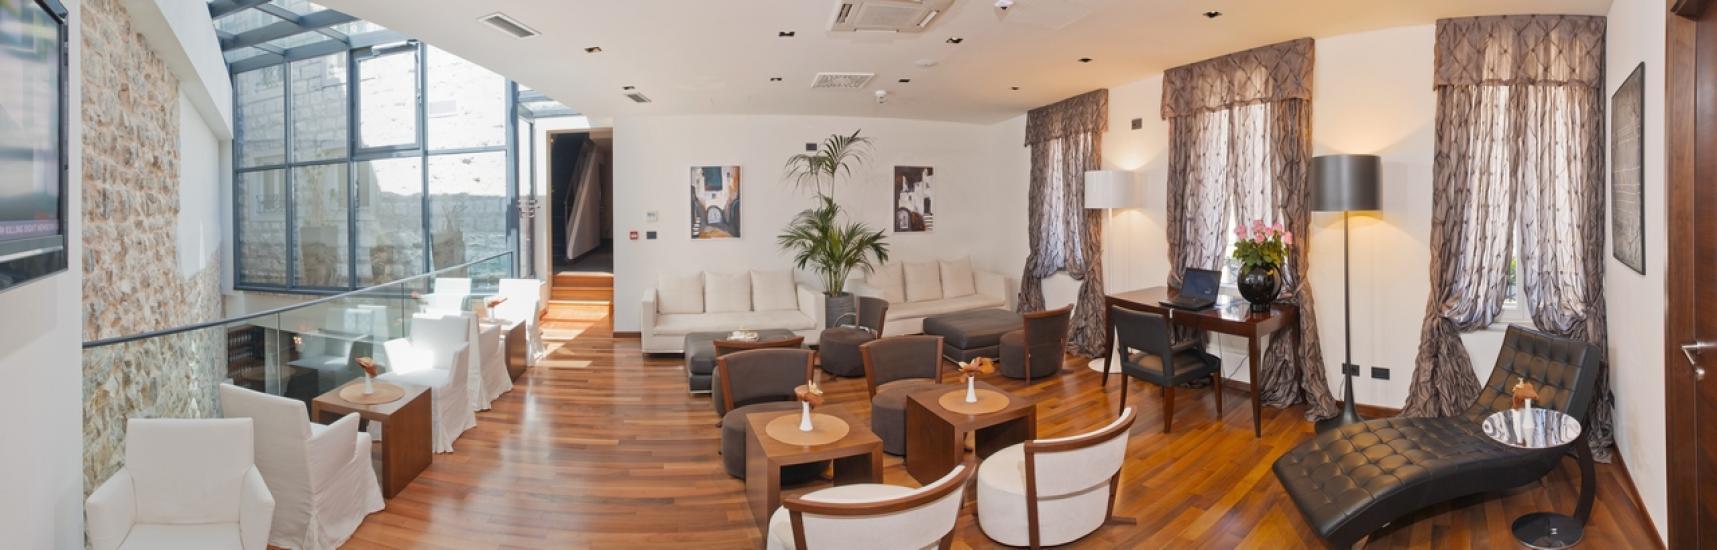 Hotel Marmont Heritage Central Dalmatia Split